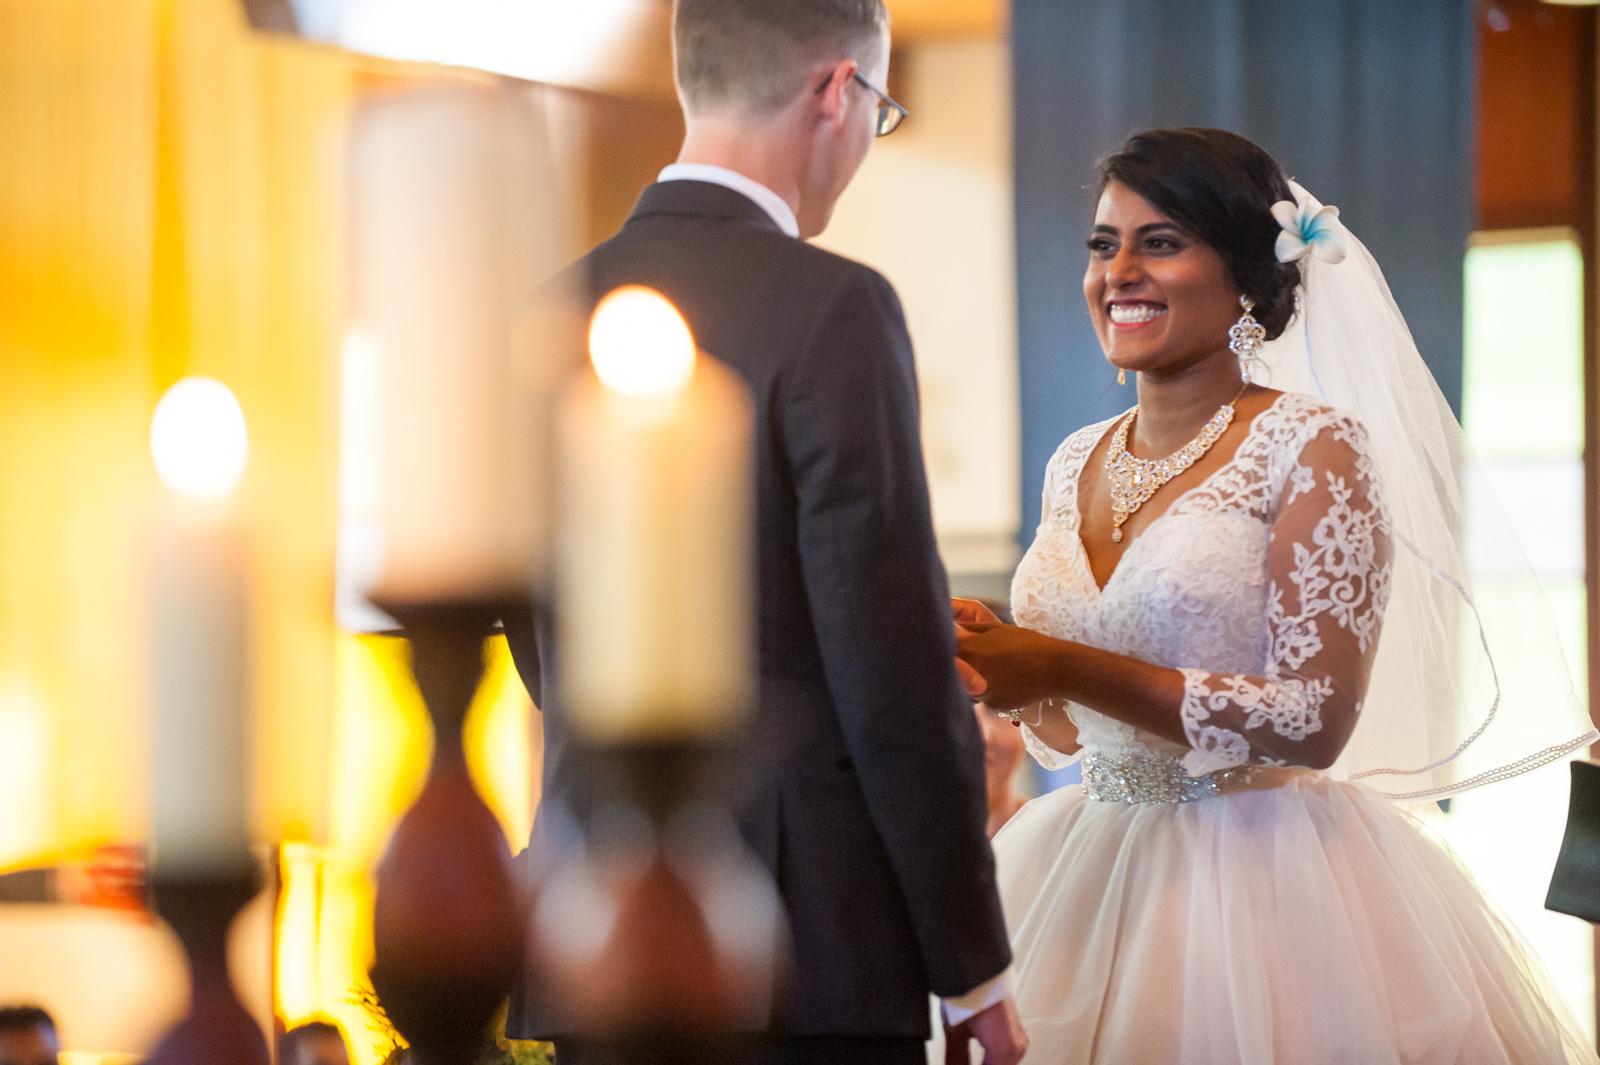 bc-wedding-photographers-paradise-banquet-hall-wedding-17.jpg